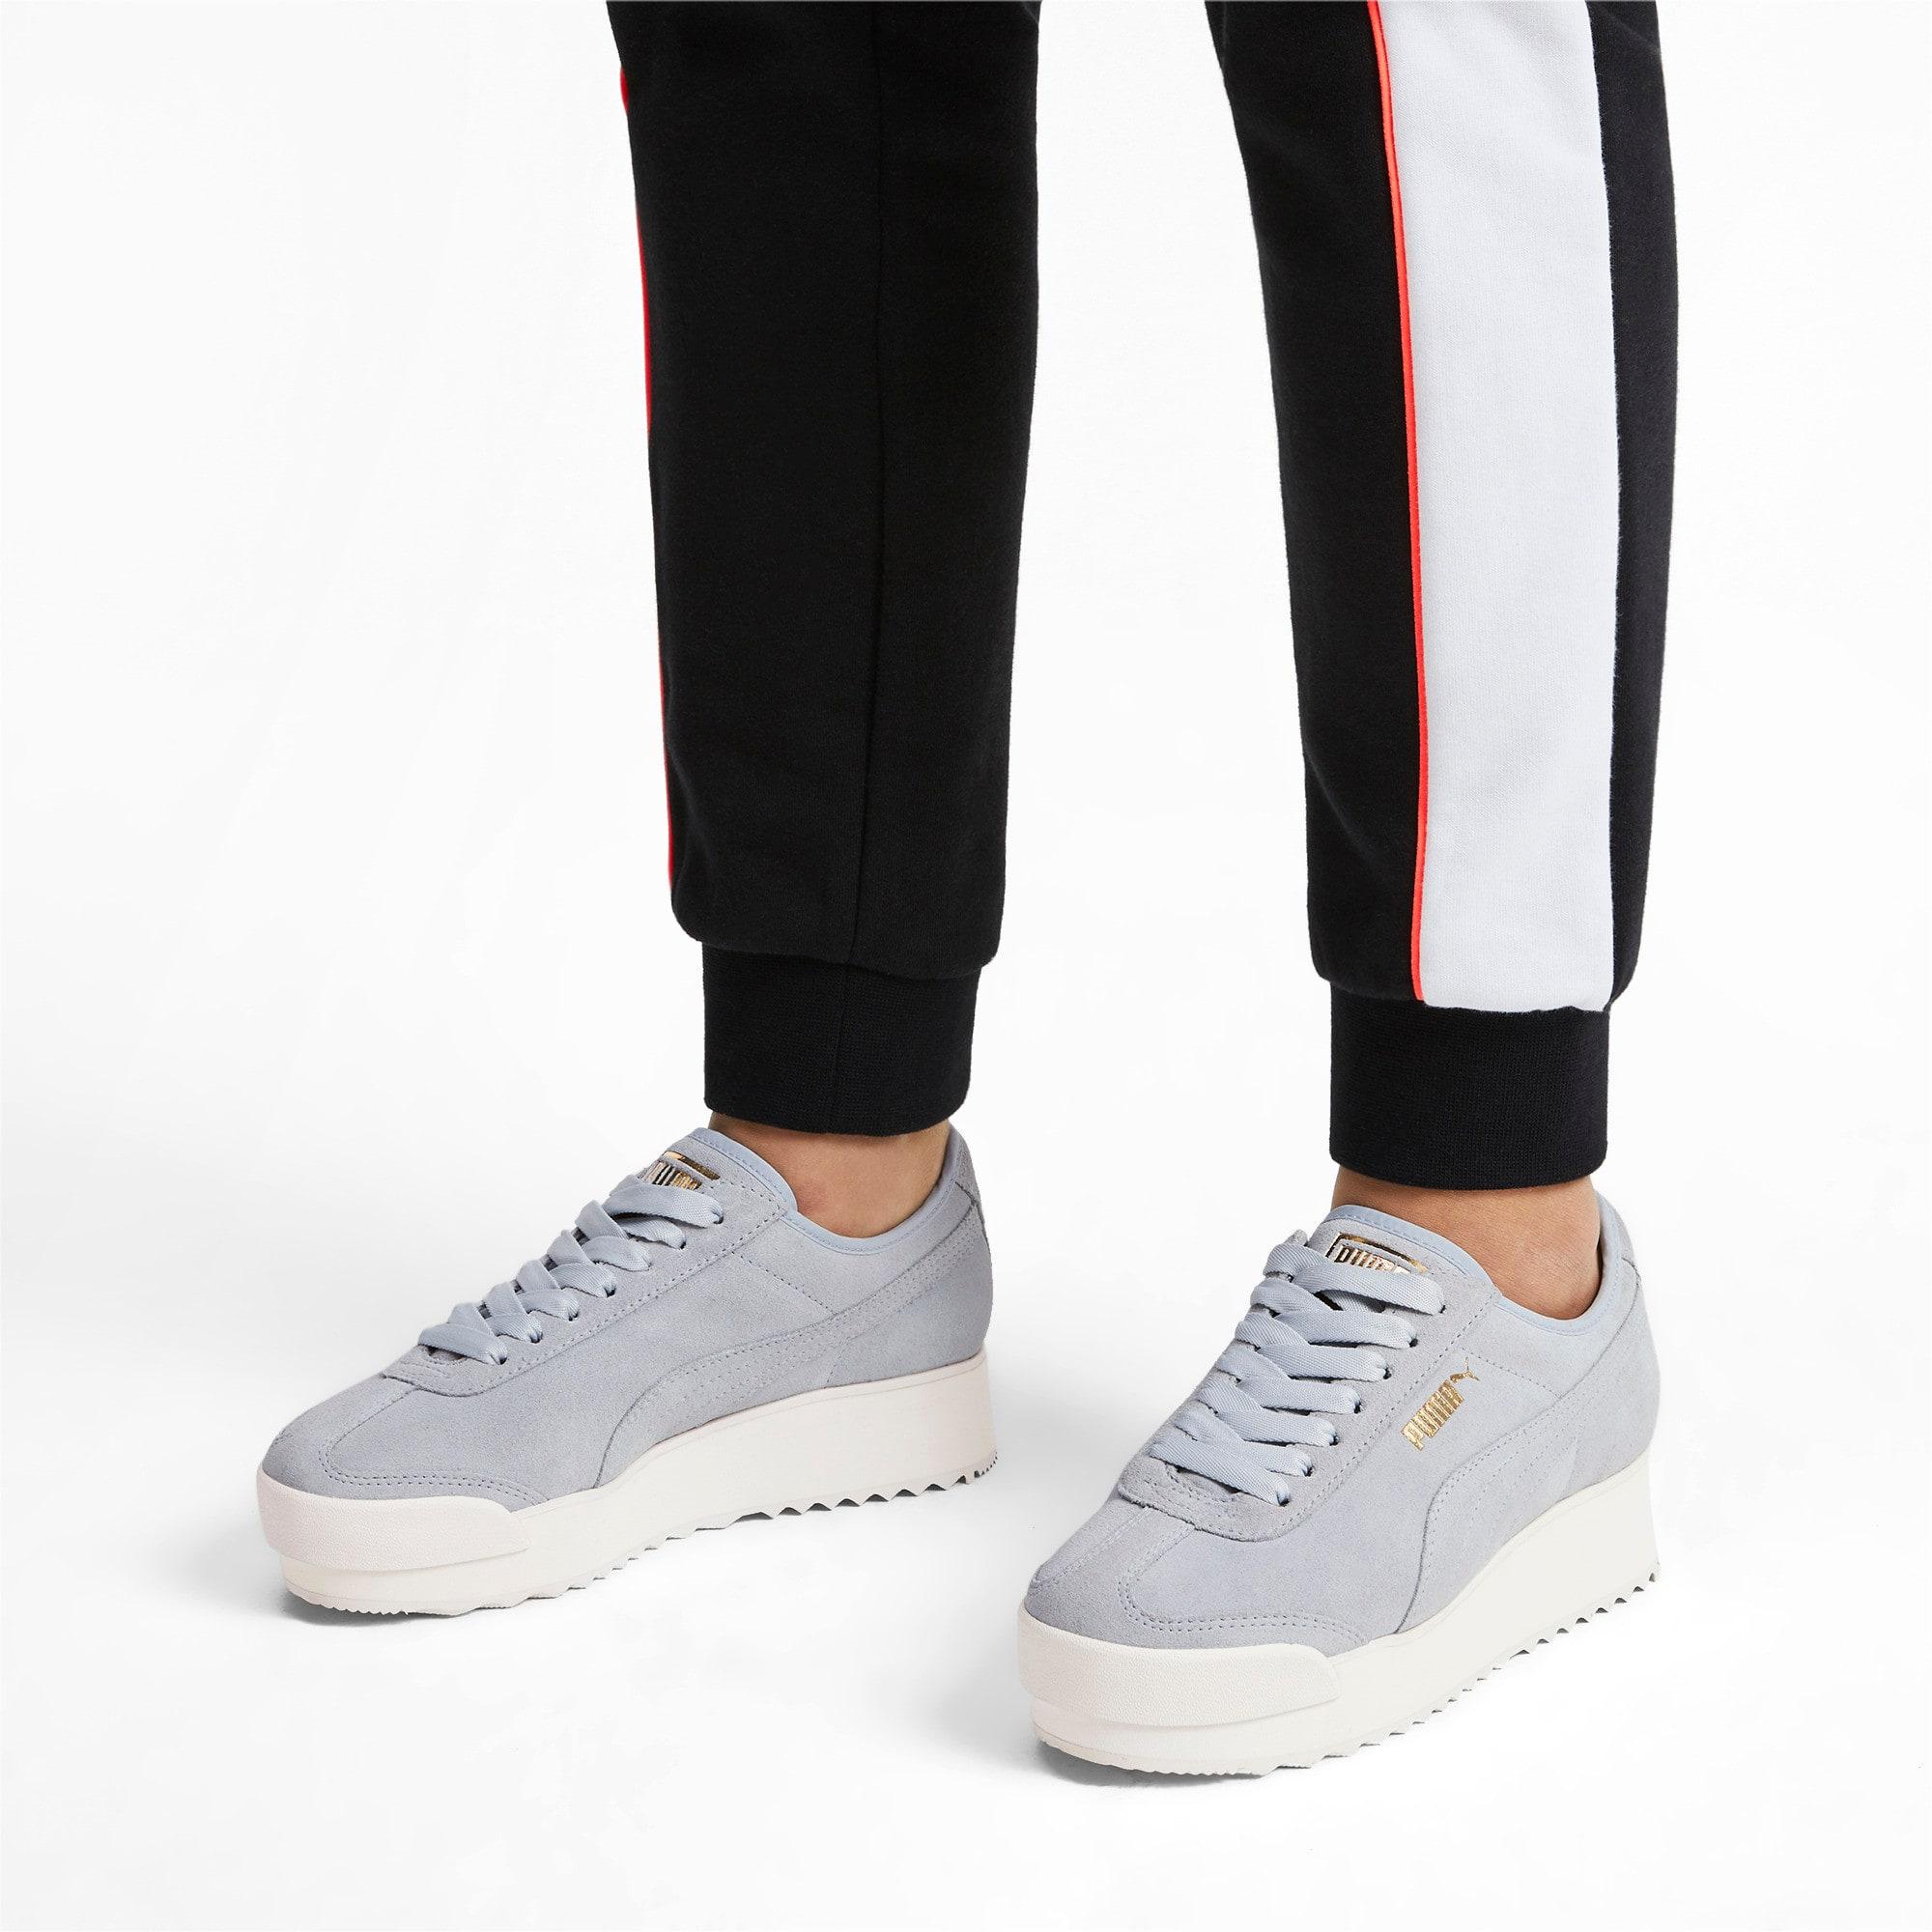 Thumbnail 3 of Roma Amor Suede Women's Sneakers, Heather-Puma Team Gold, medium